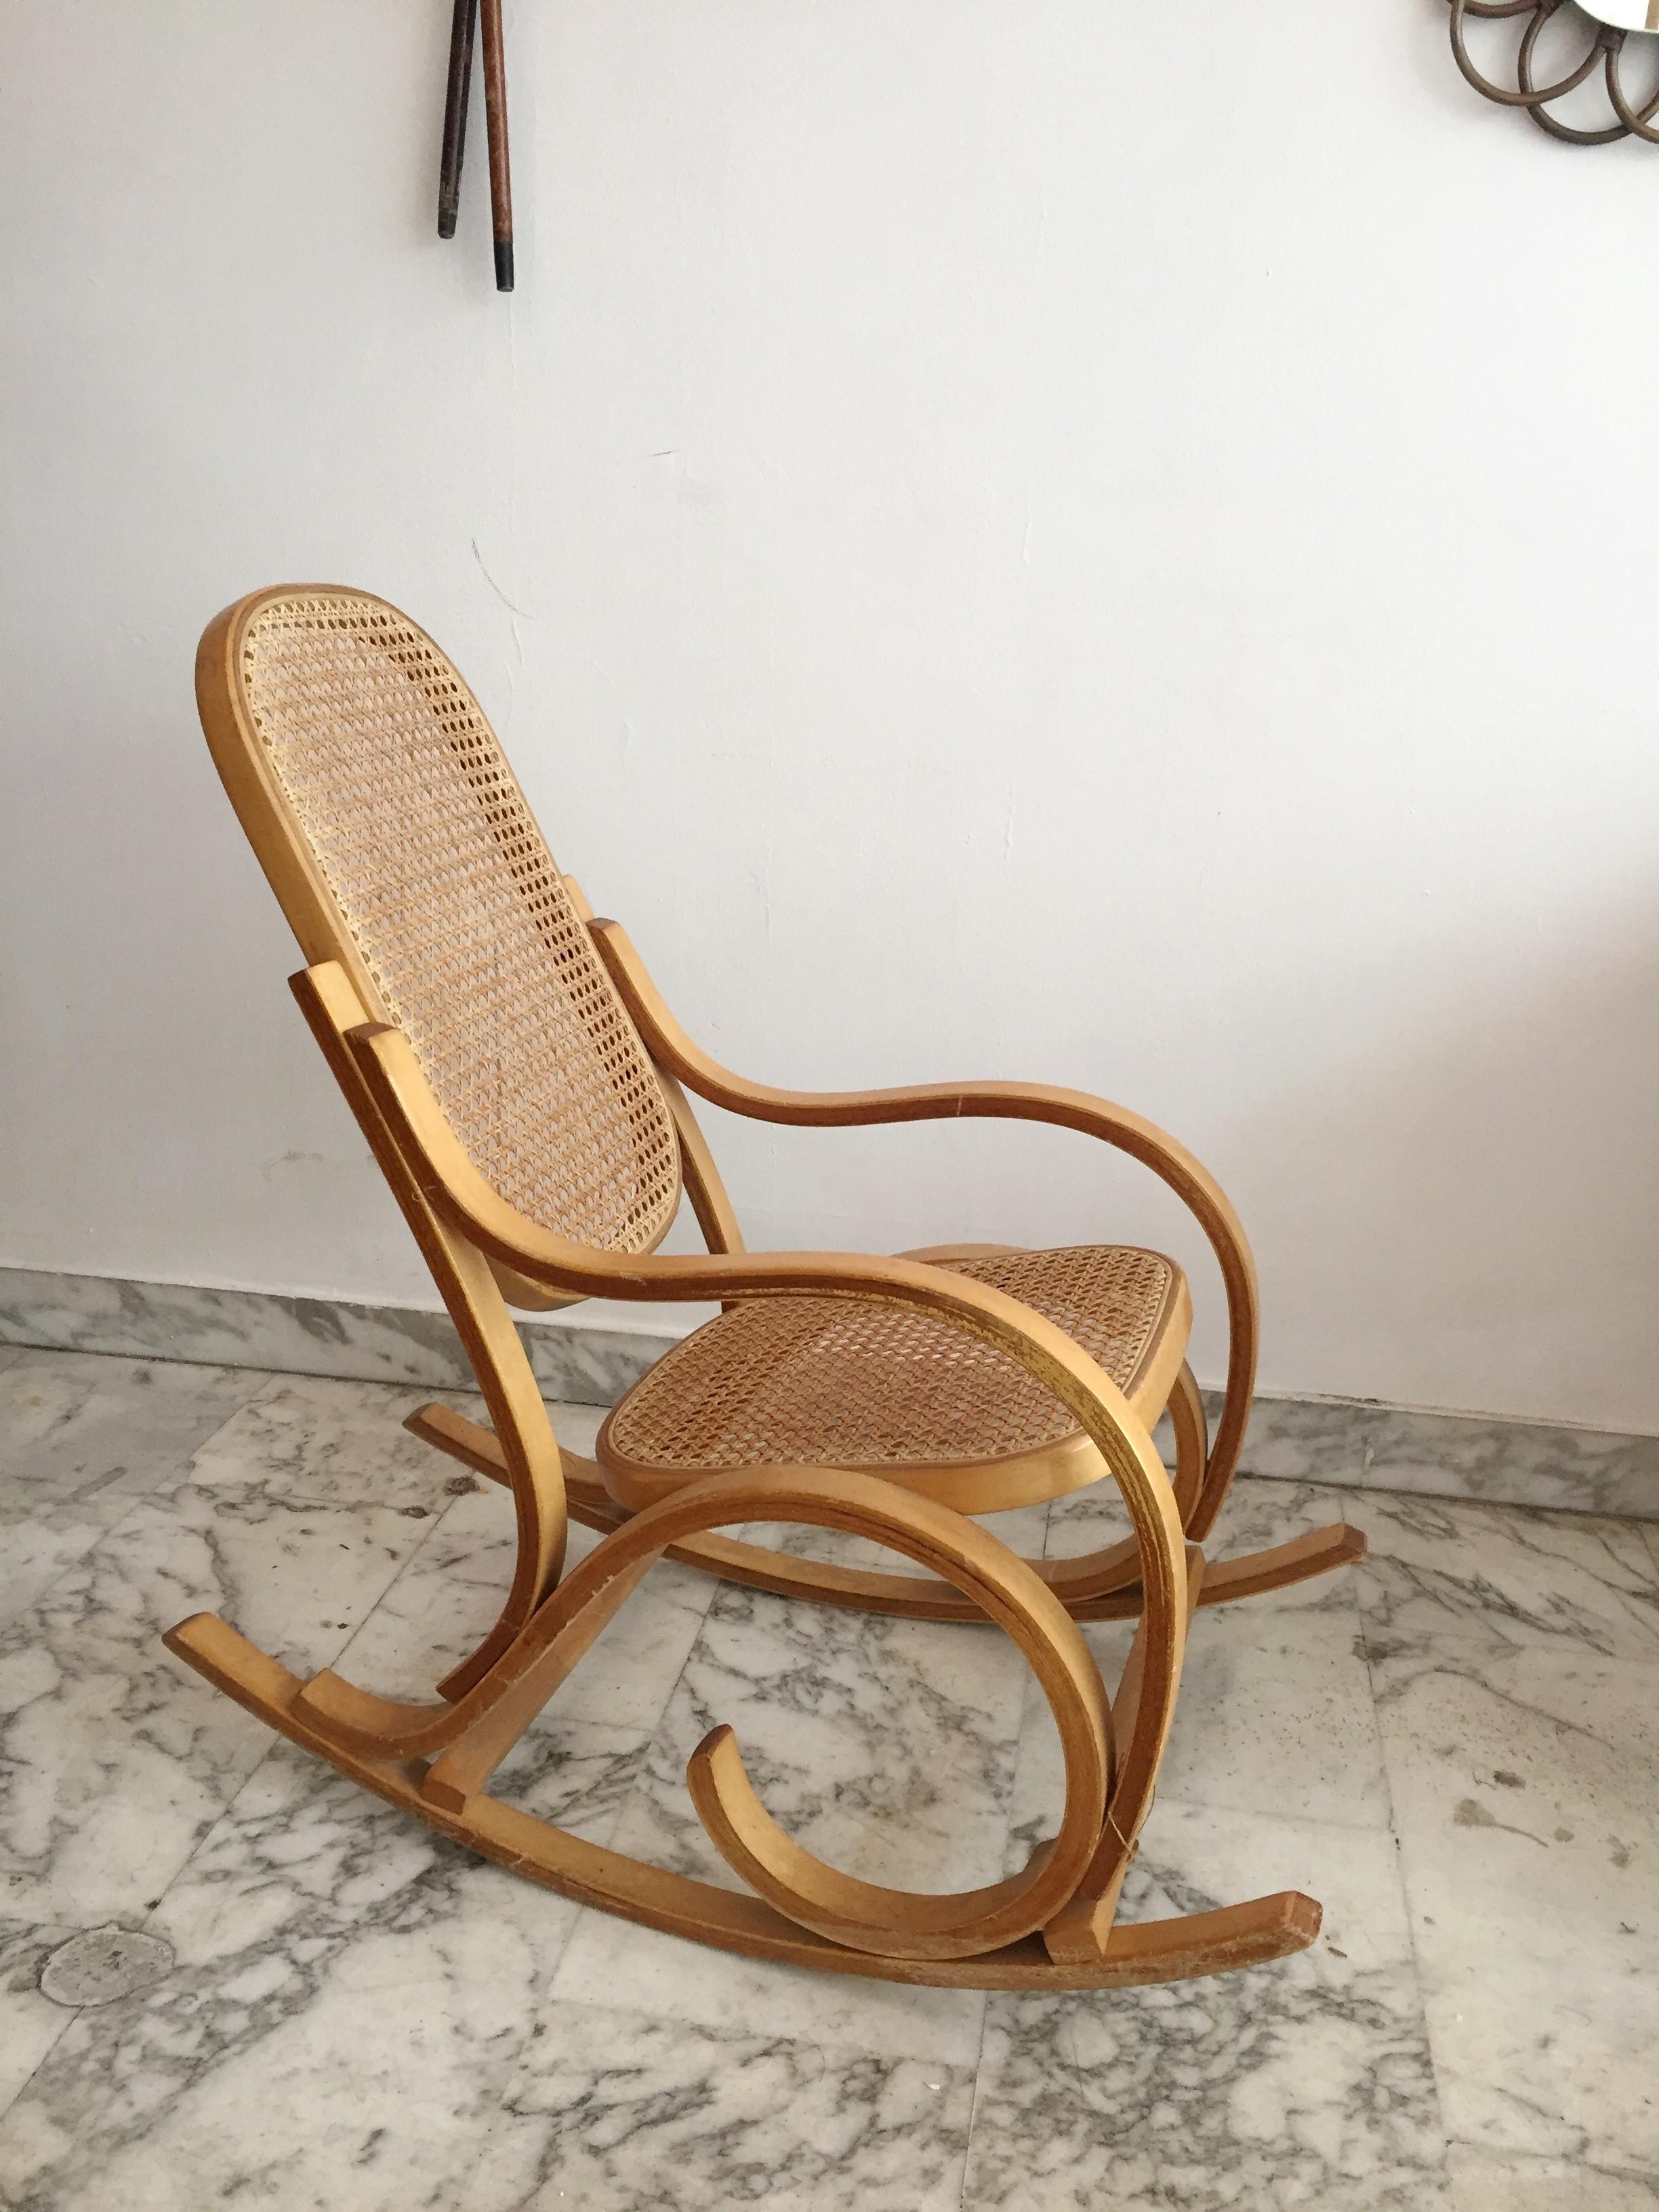 Attractive Vintage Kid Rocking Chair   1960s. Previous Next